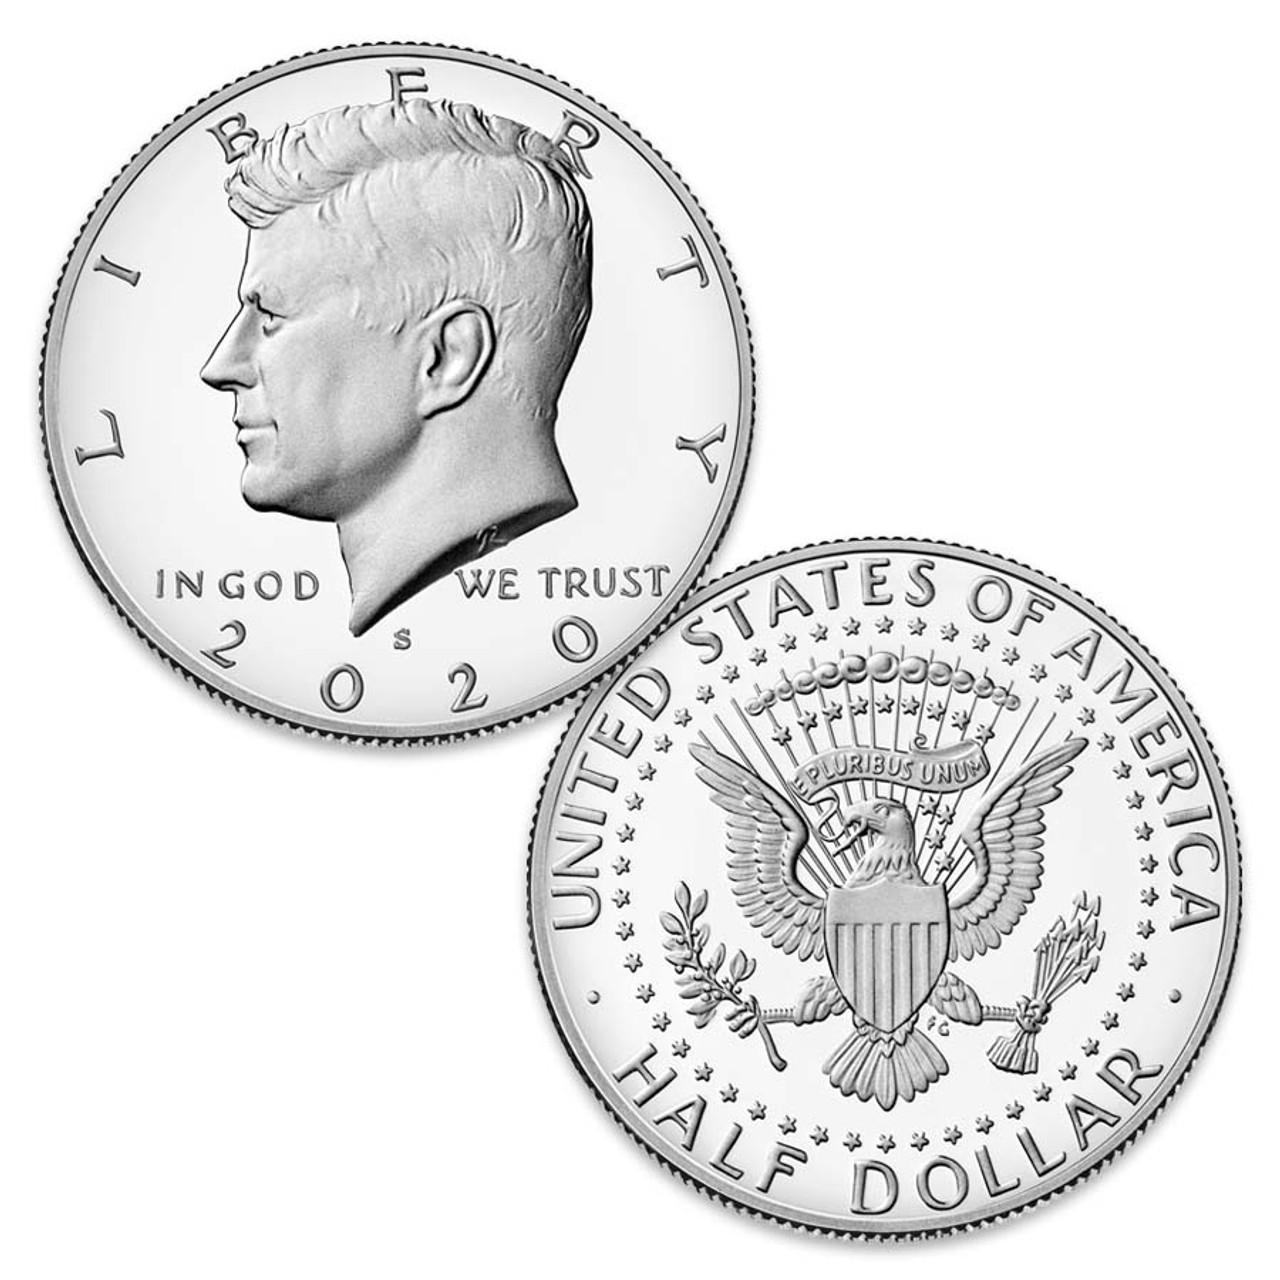 2020-S Kennedy Half Dollar Proof Image 1